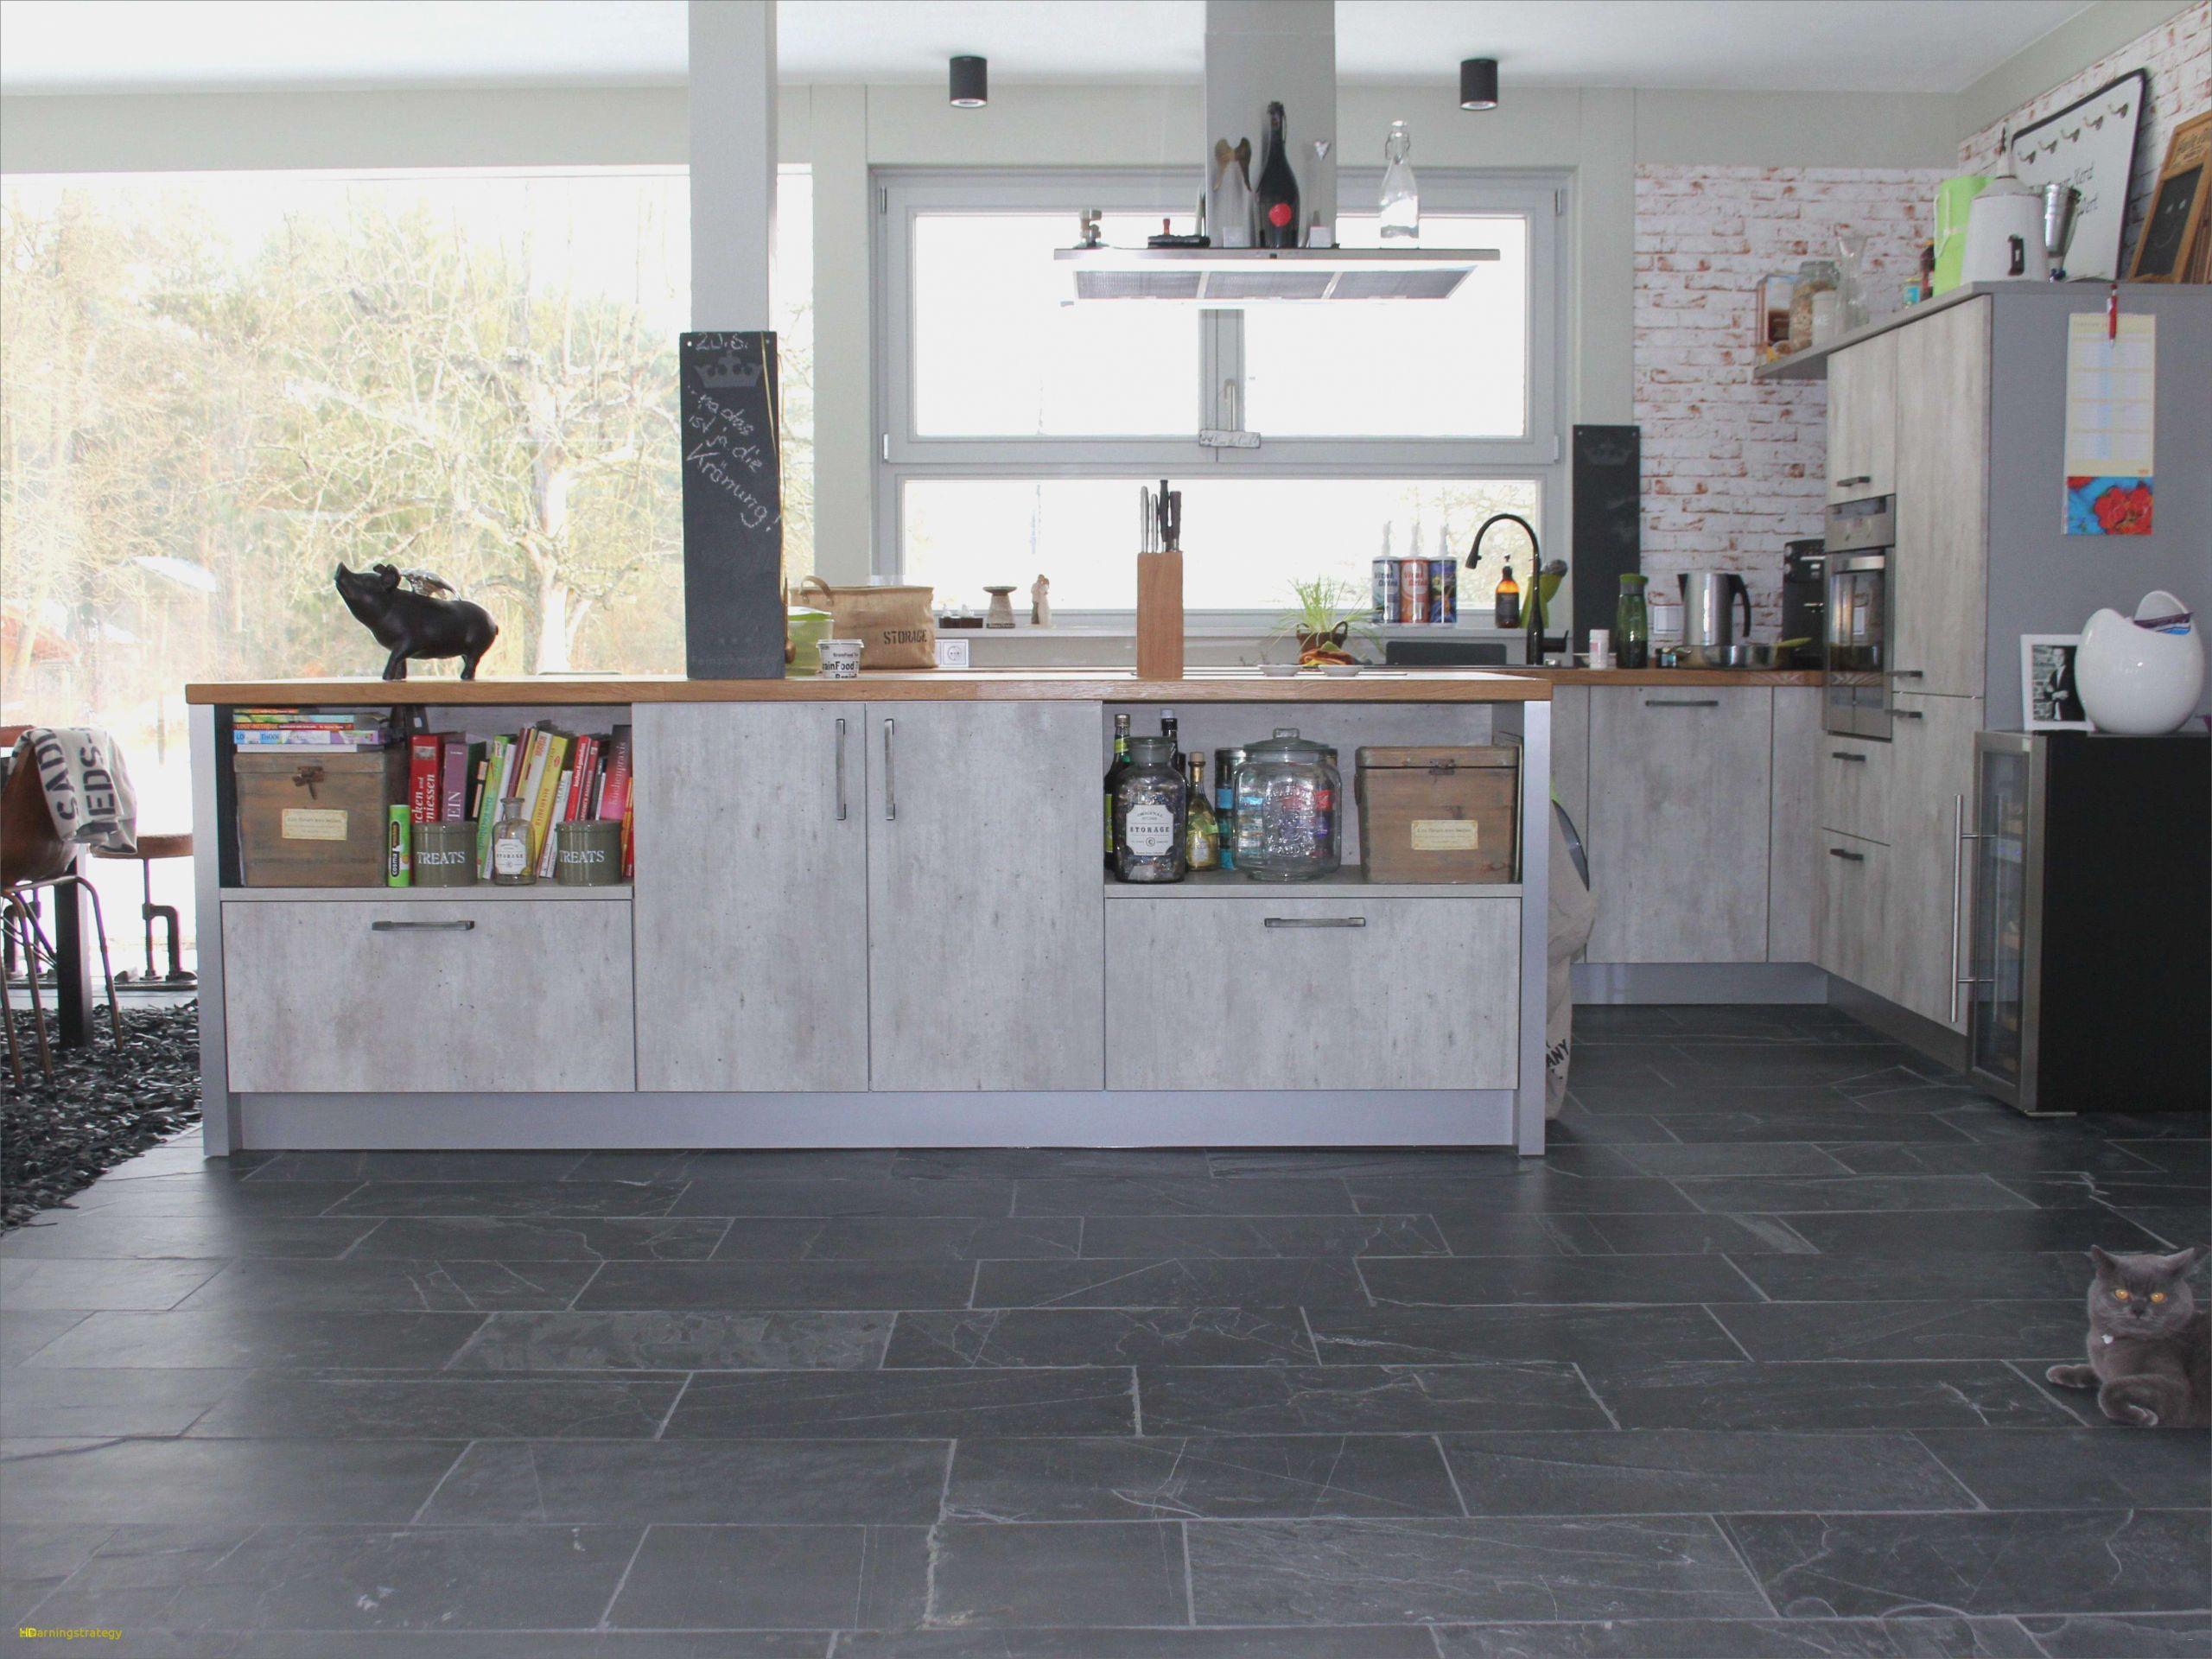 45 luxus deko ideen kuche galerie kuchen fur dachgeschosswohnungen kuchen fur dachgeschosswohnungen 1